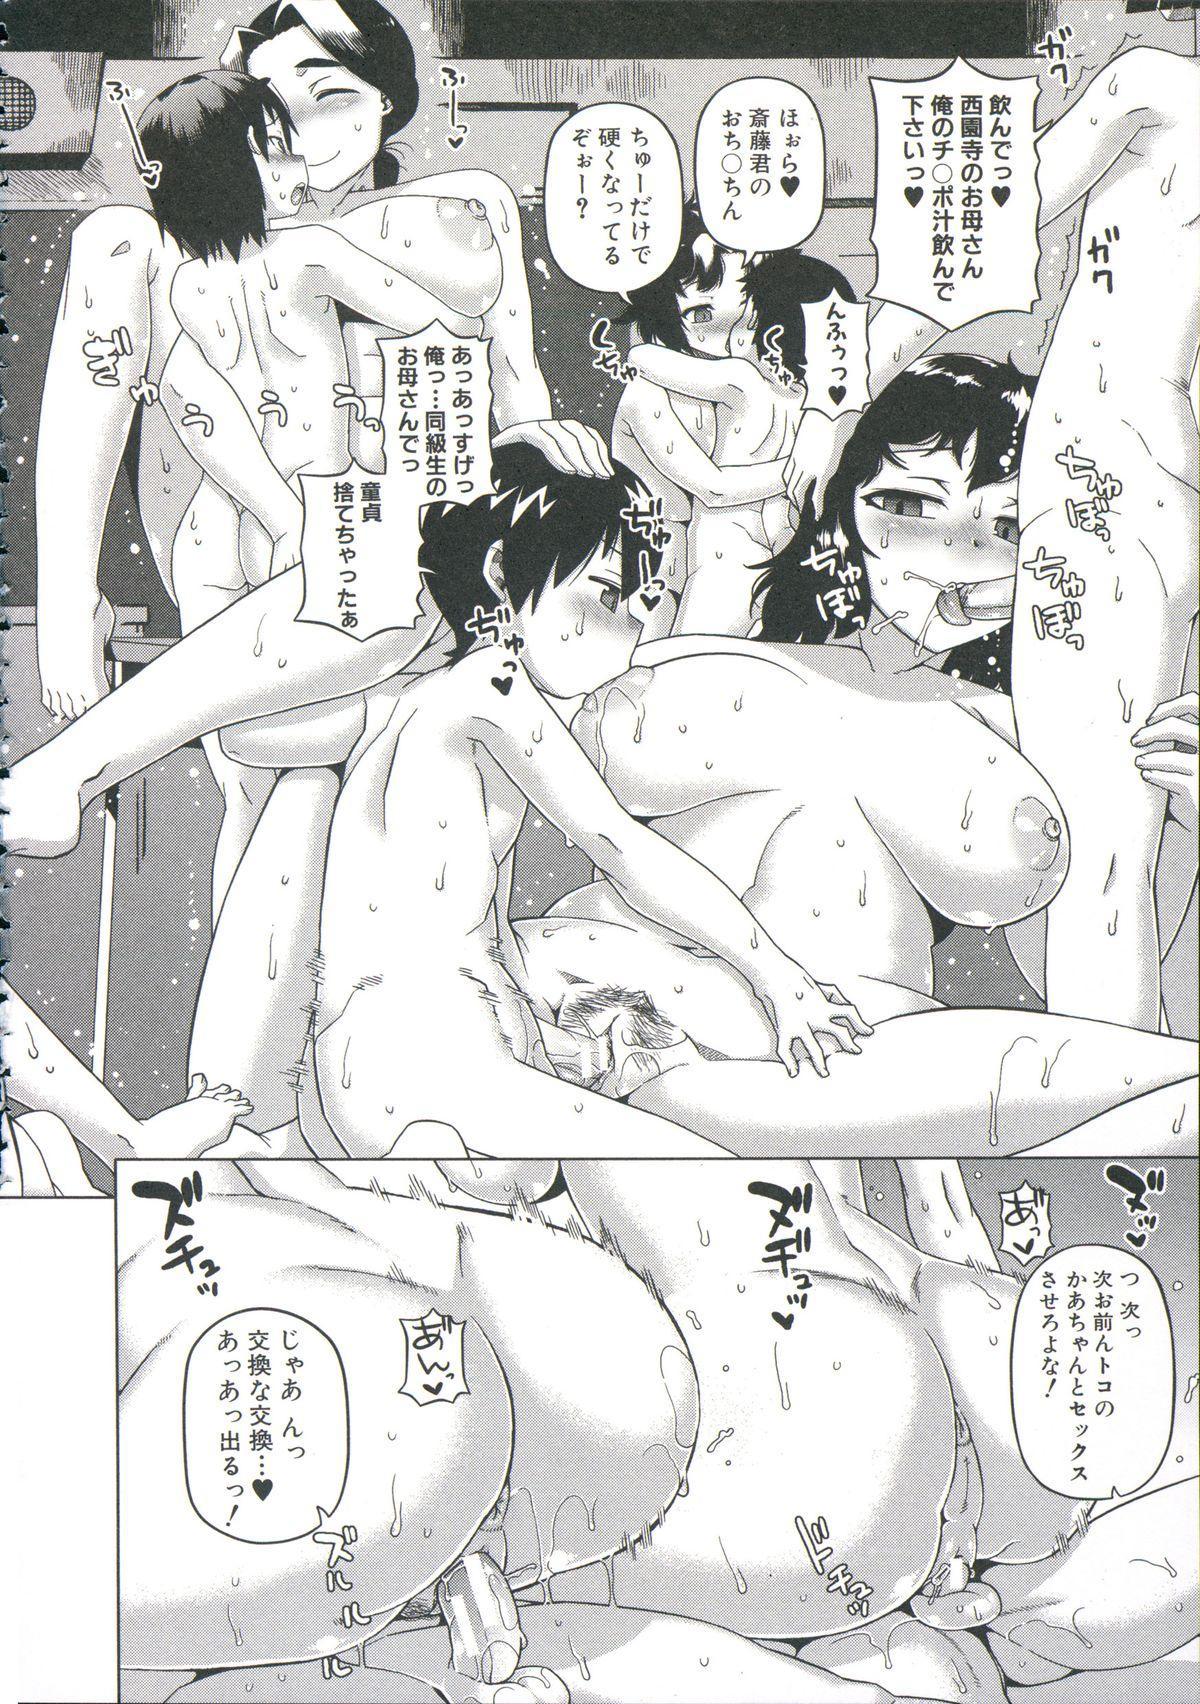 [Takatsu] Ou-sama Appli - King App 156